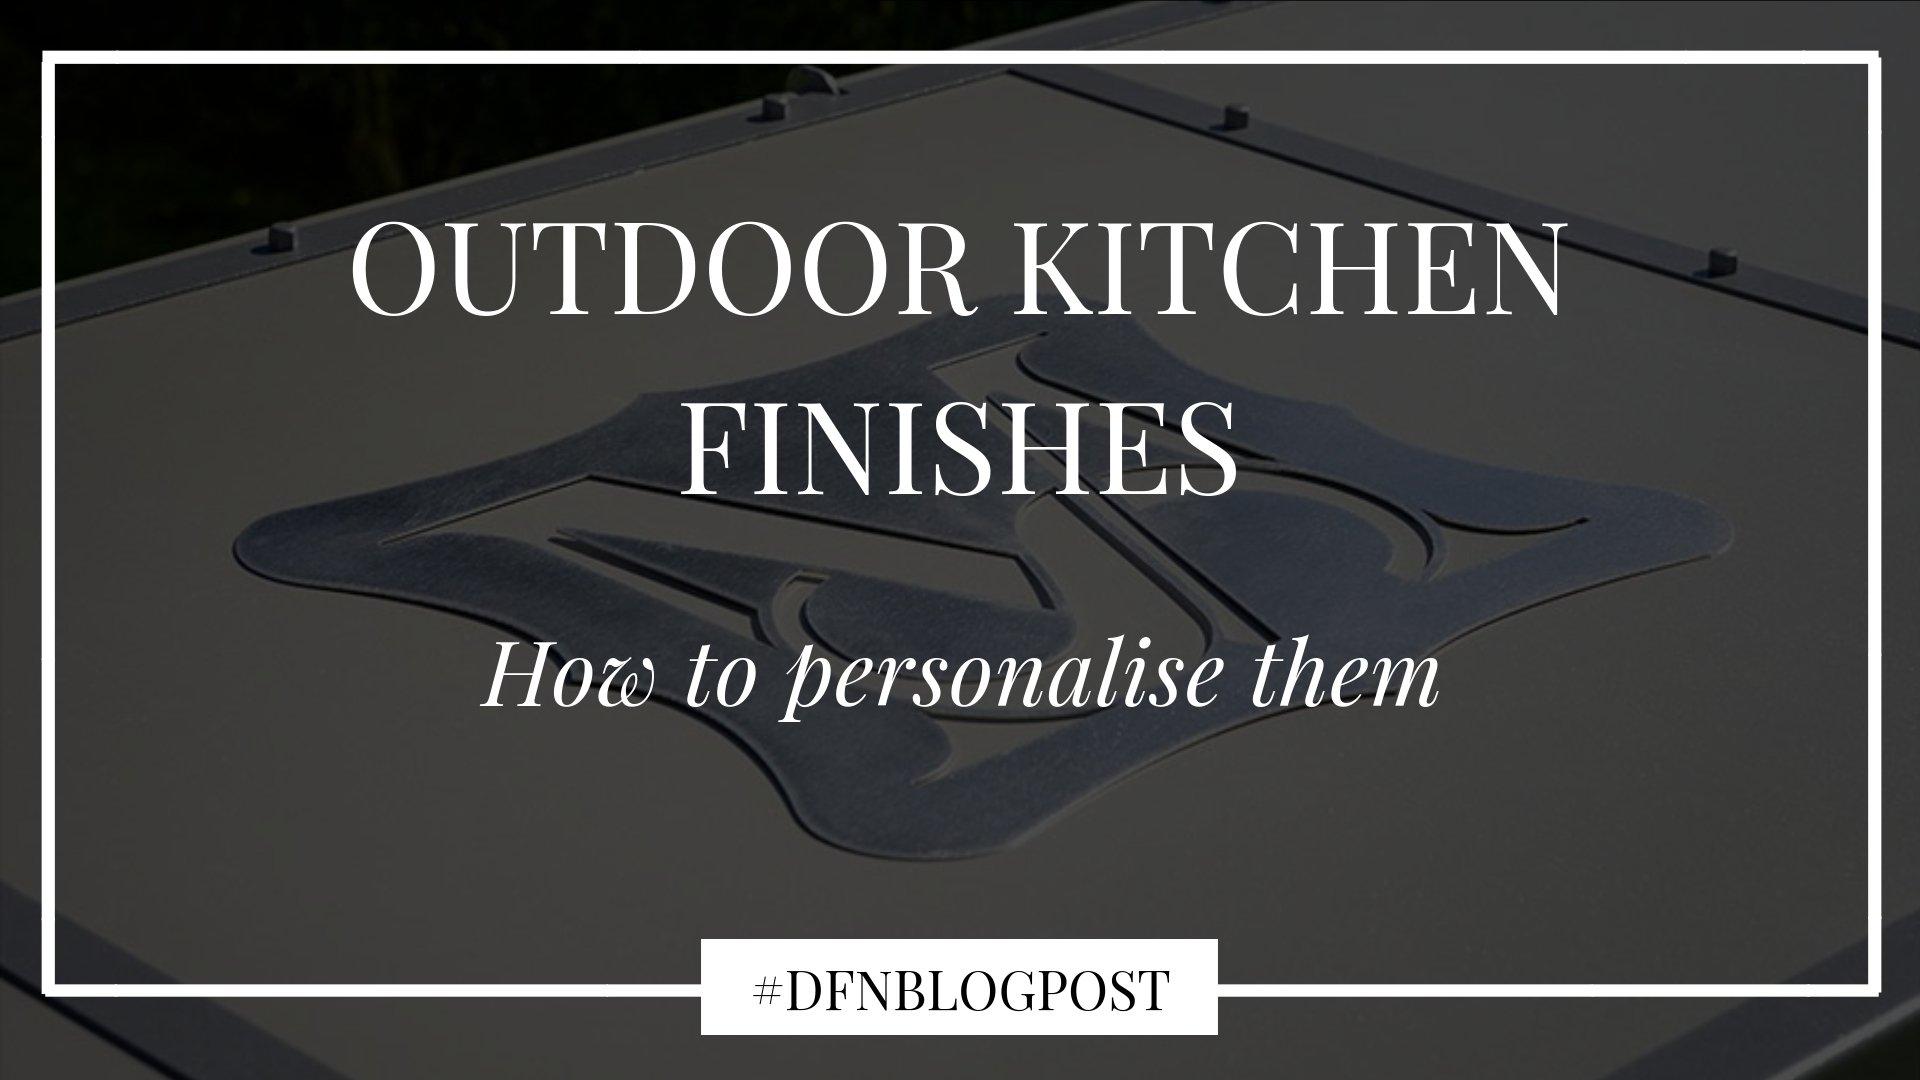 dfn-outdoor-kitchen-finishes-banner